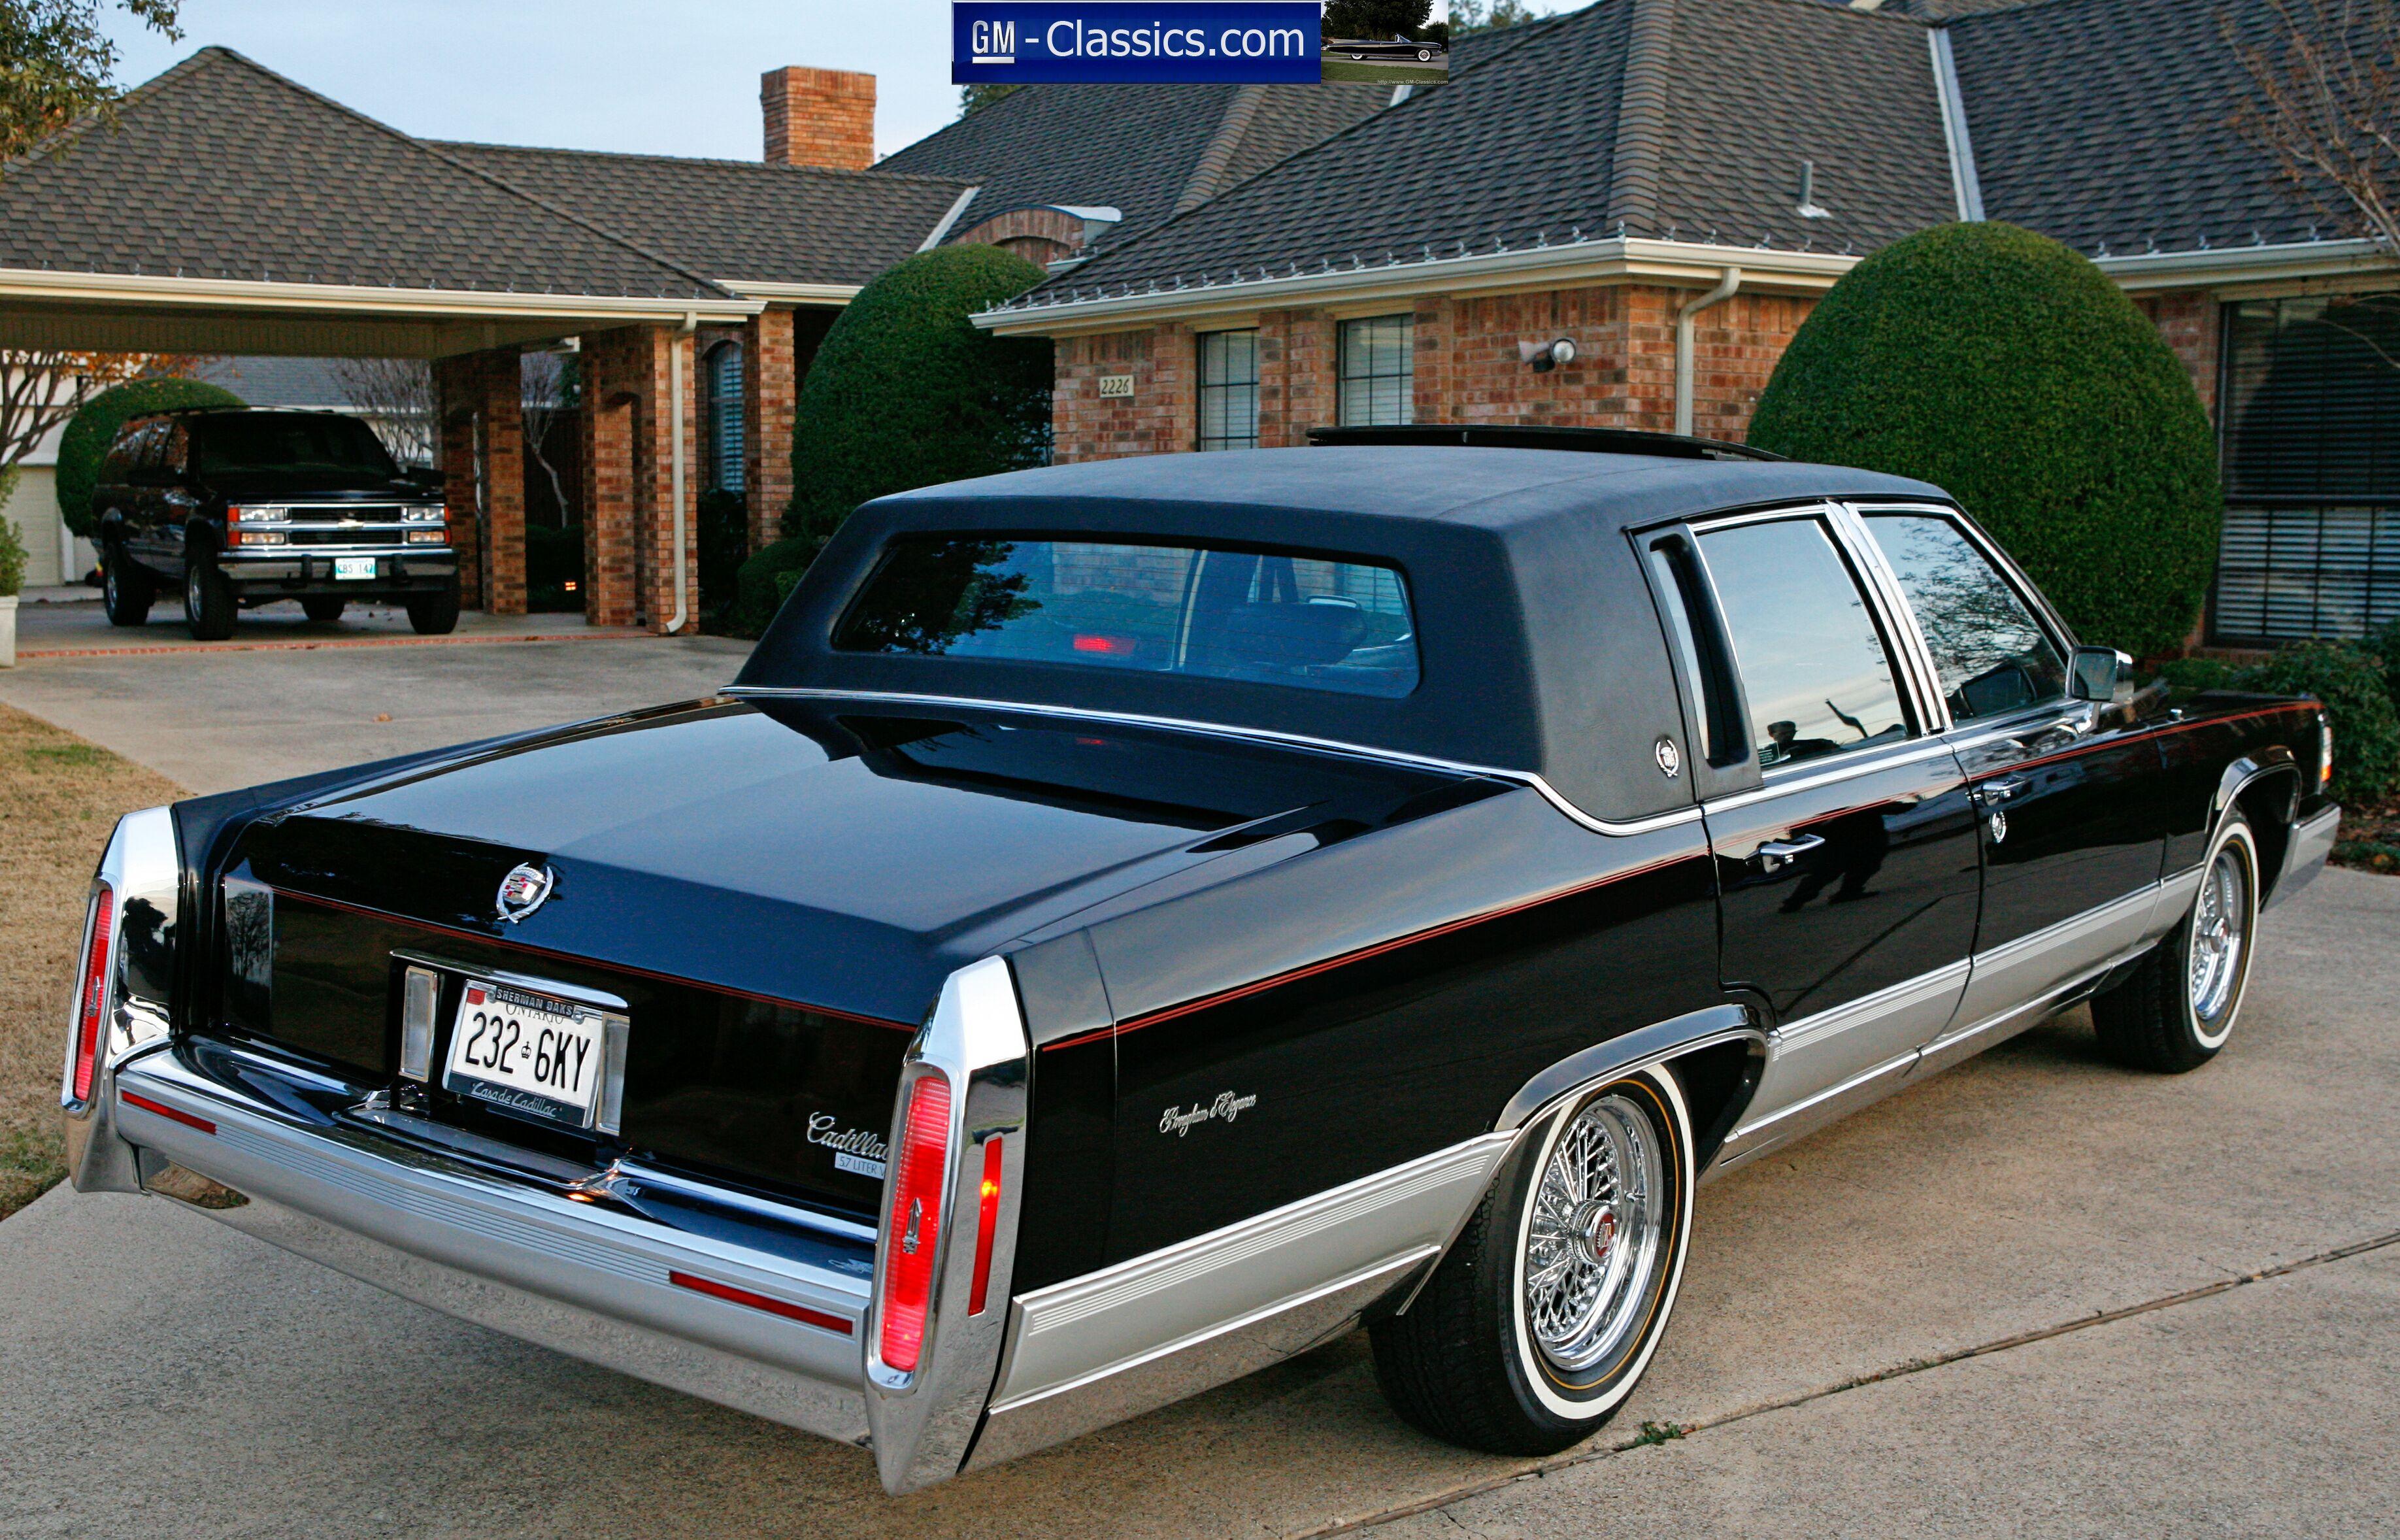 freshly limousine for rebuilt sale sedan cadillac pin fleetwood